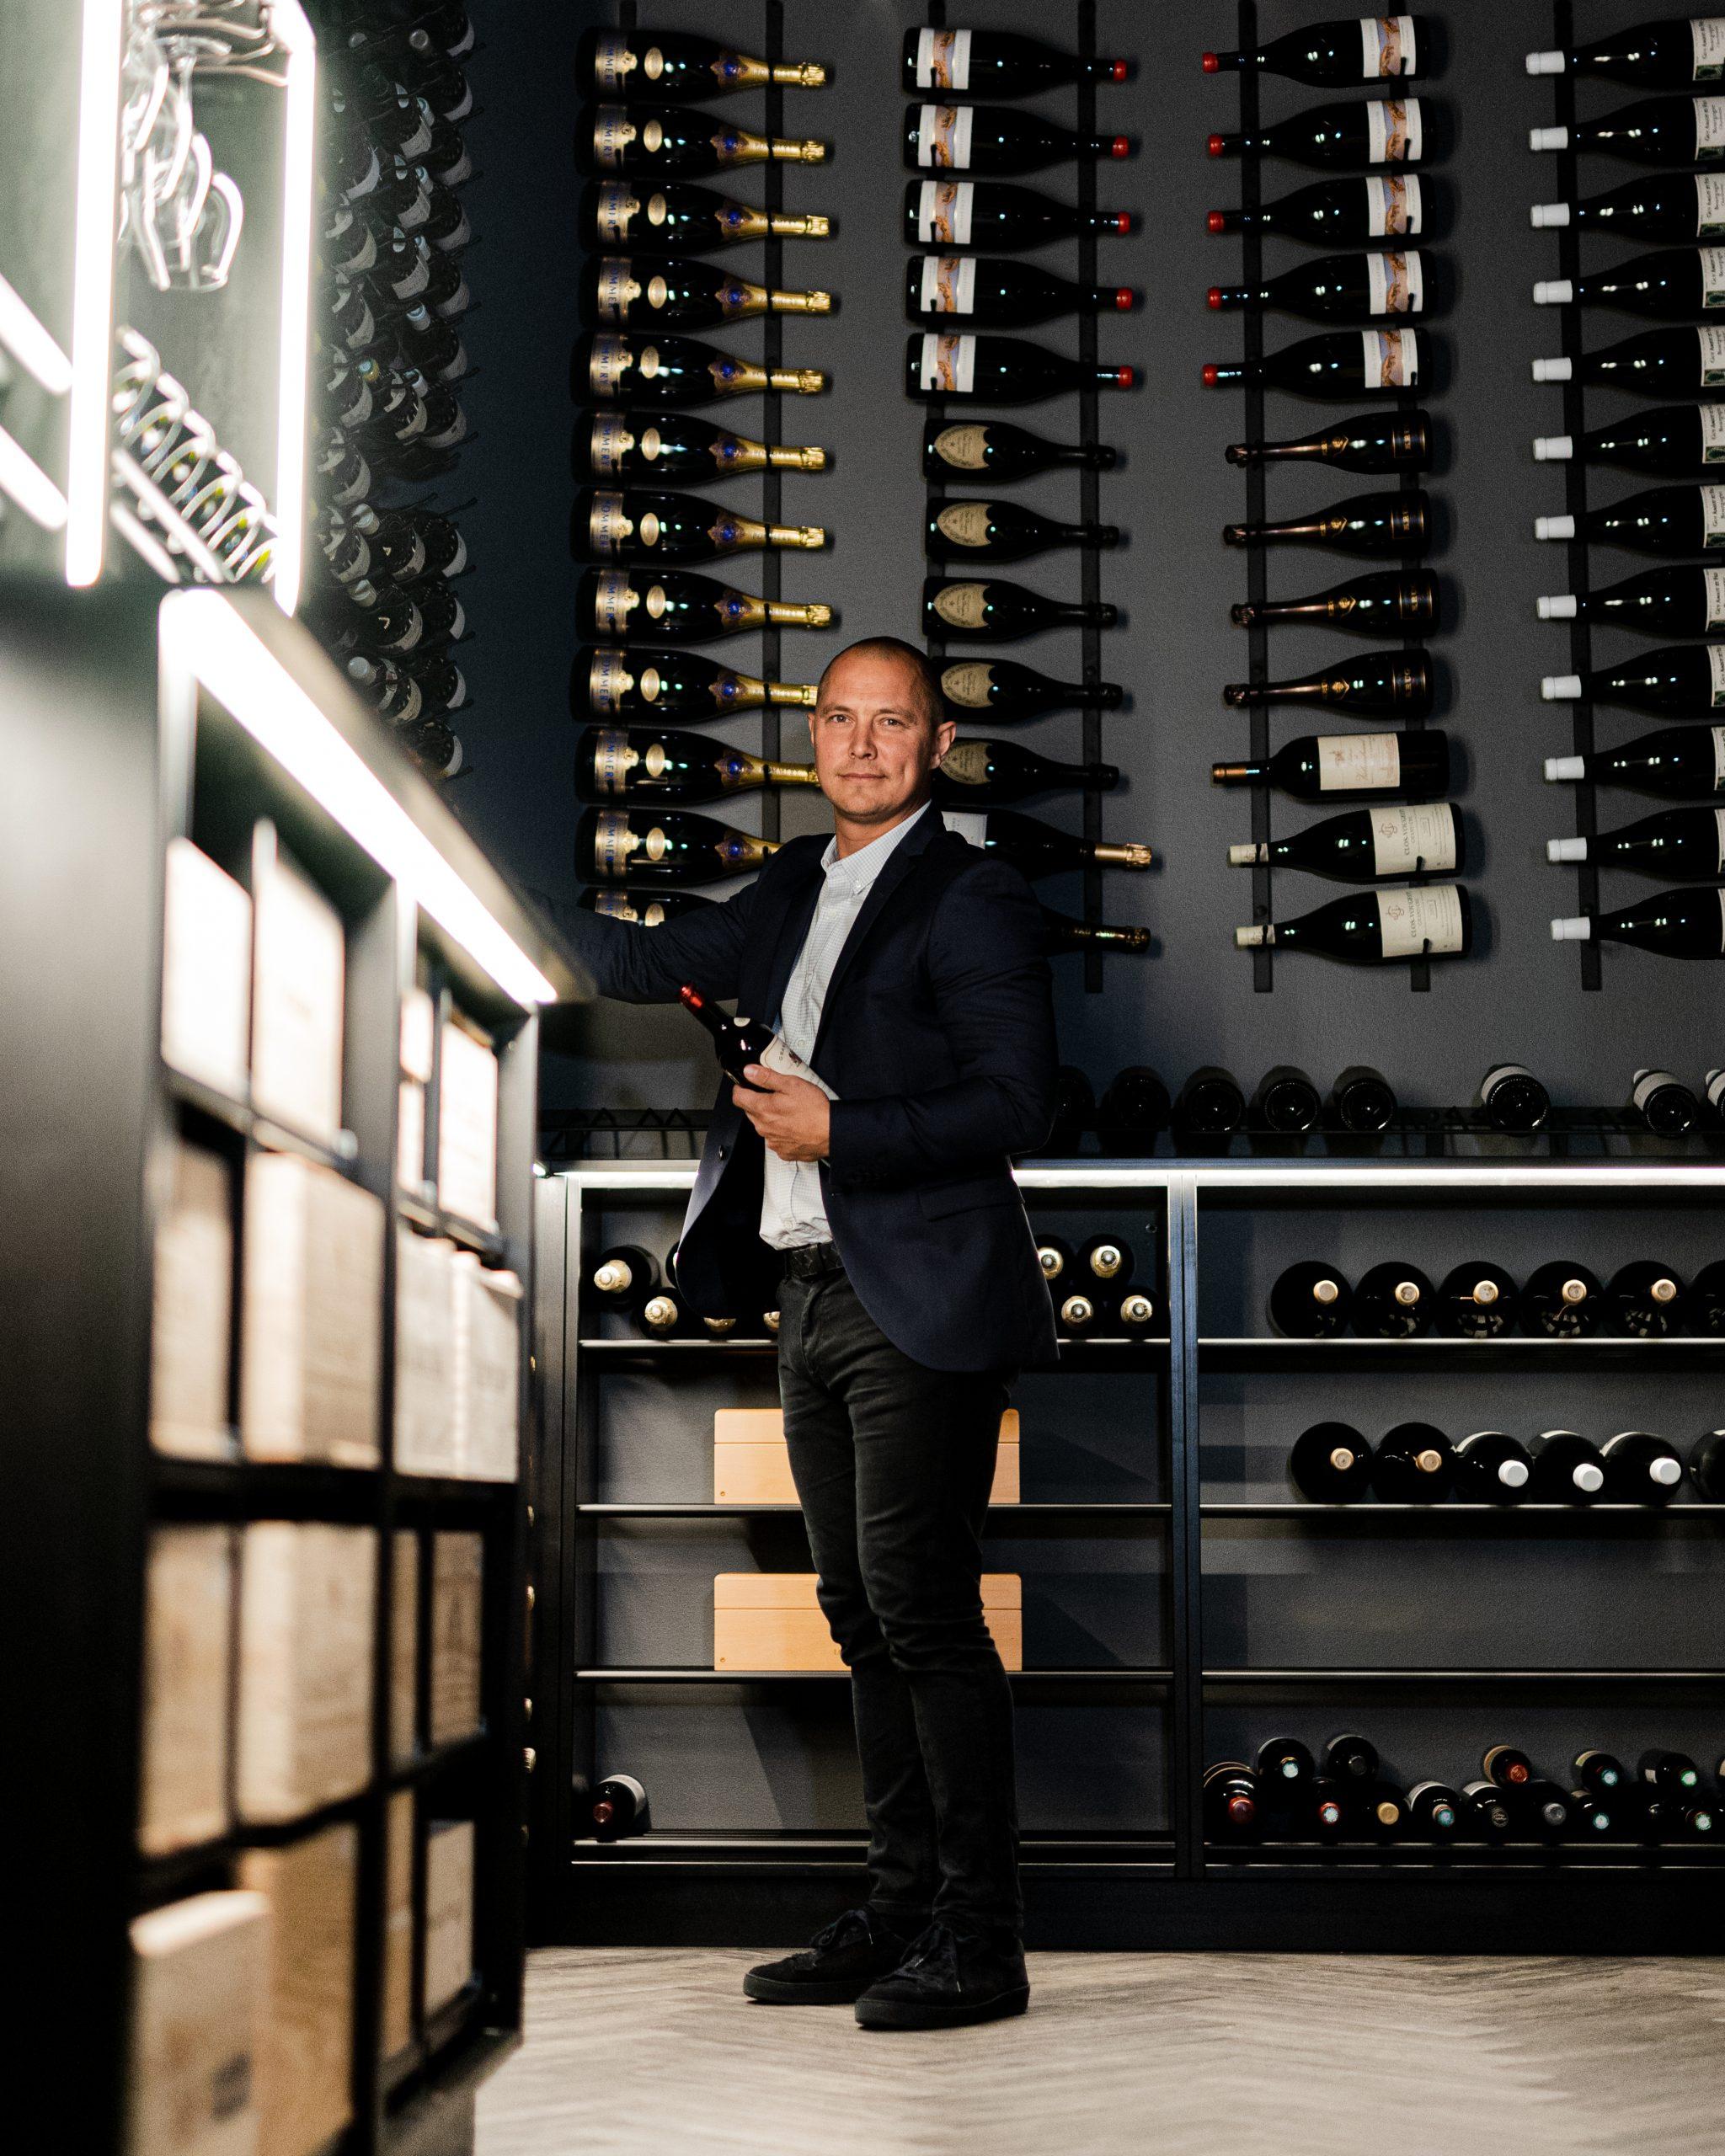 Vinkometen fra Aalborg: RareWine kommer ud med rekordregnskab